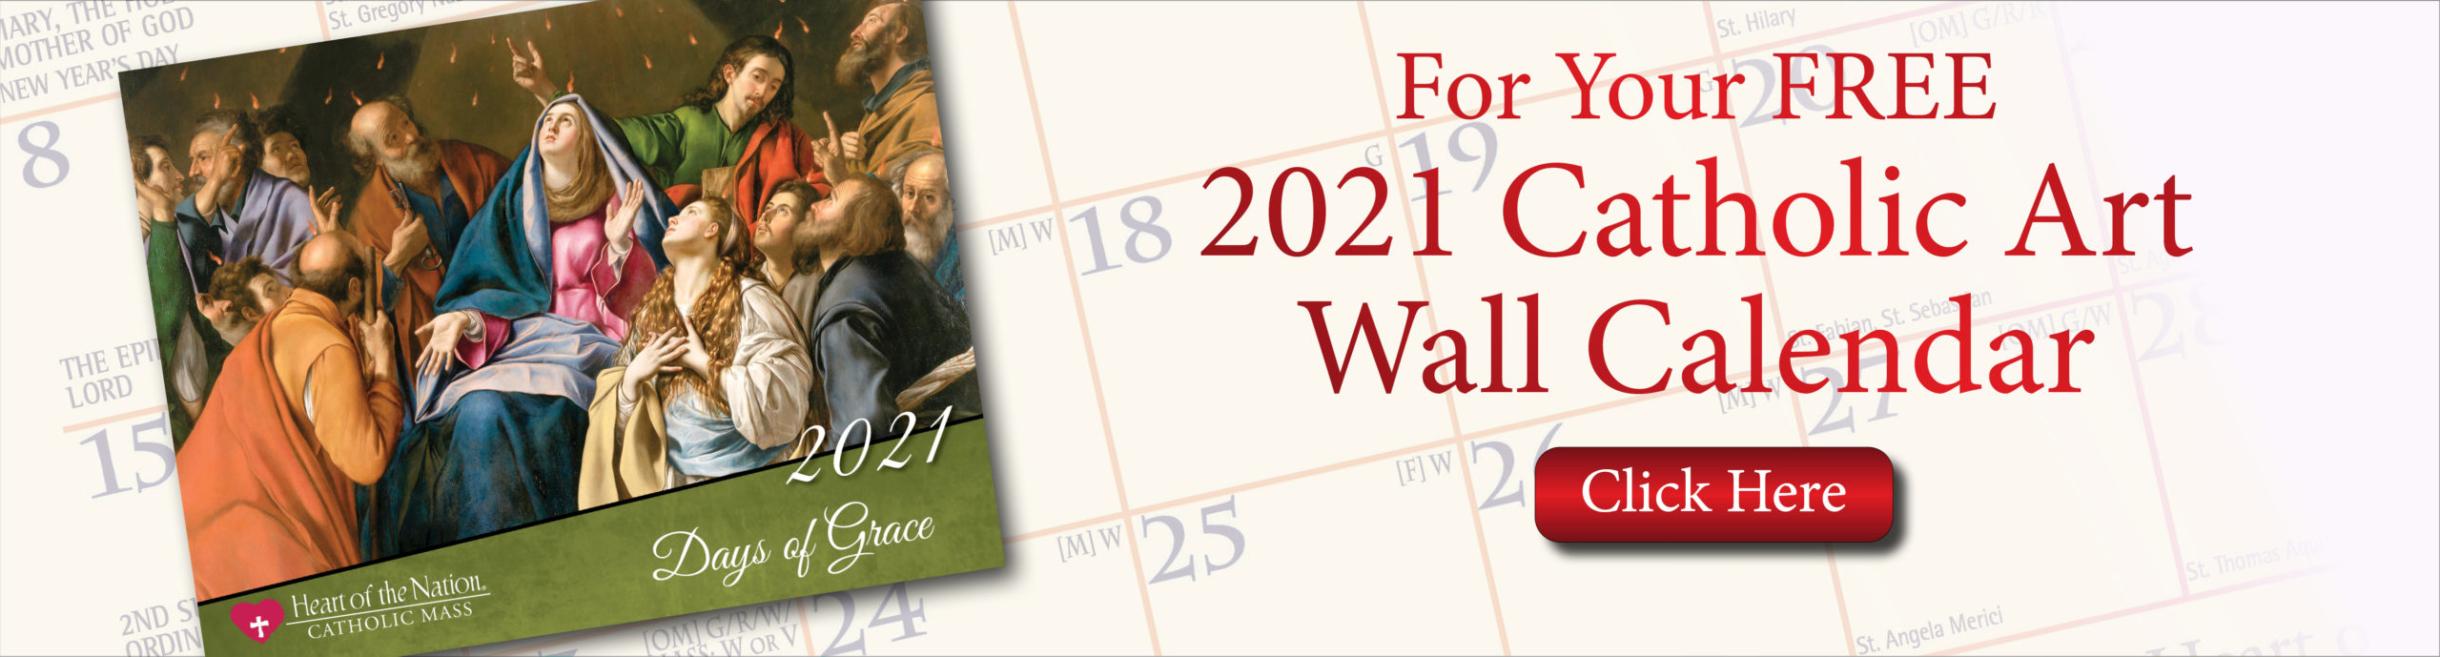 Hotn :: Catholic Mass Online - Catholic Prayers & Resources throughout Daily Mass Intercessions 2021